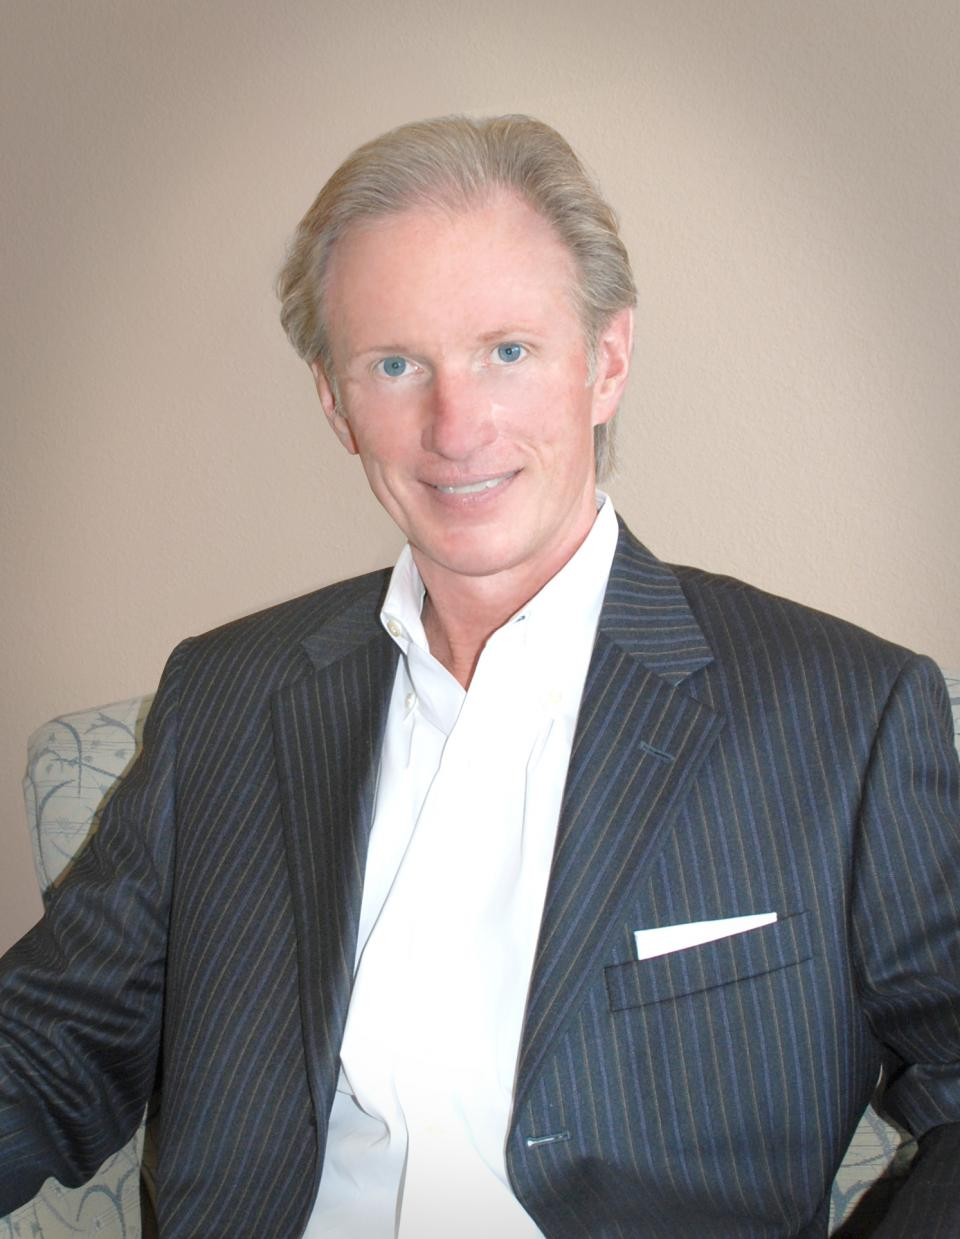 ELM's Chief Executive Officer, Jon Veenis